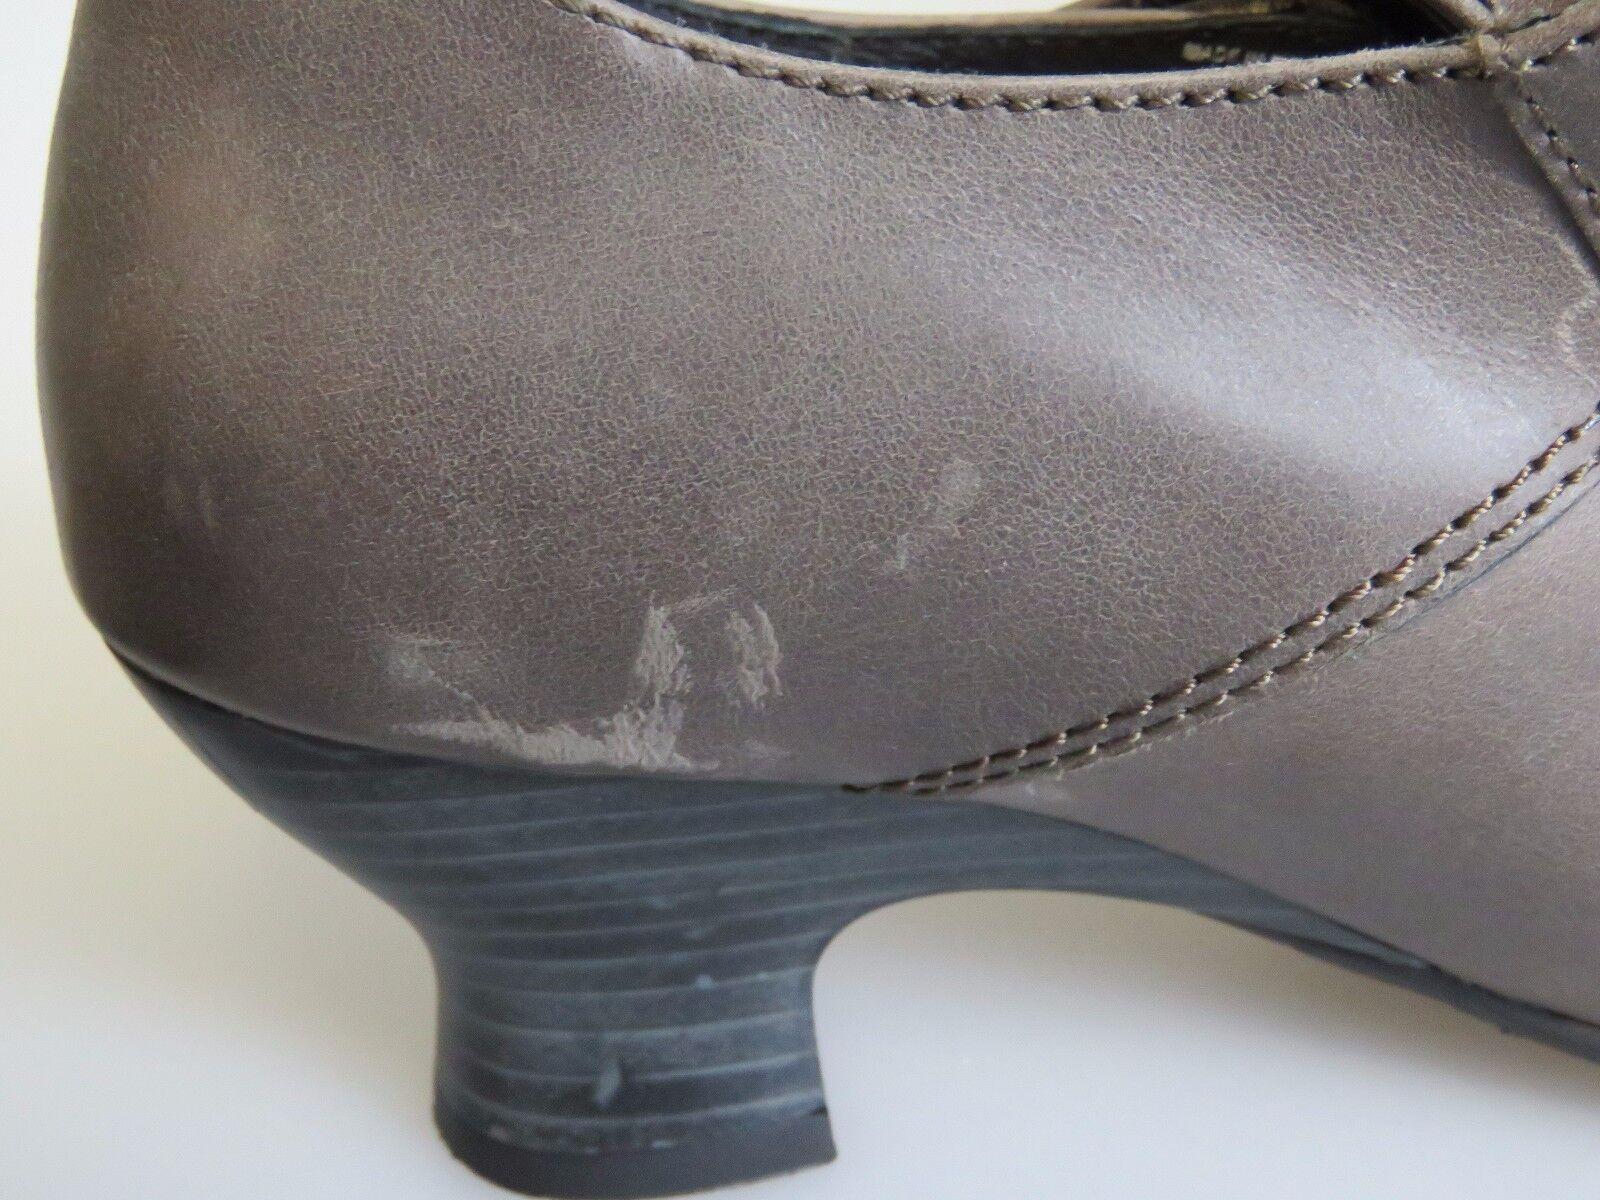 WOLKY Prague Prague Prague II Leather Heels Adjustable Hook & Loop Strap schuhe Sz 39 (US 8) 9fb7e1